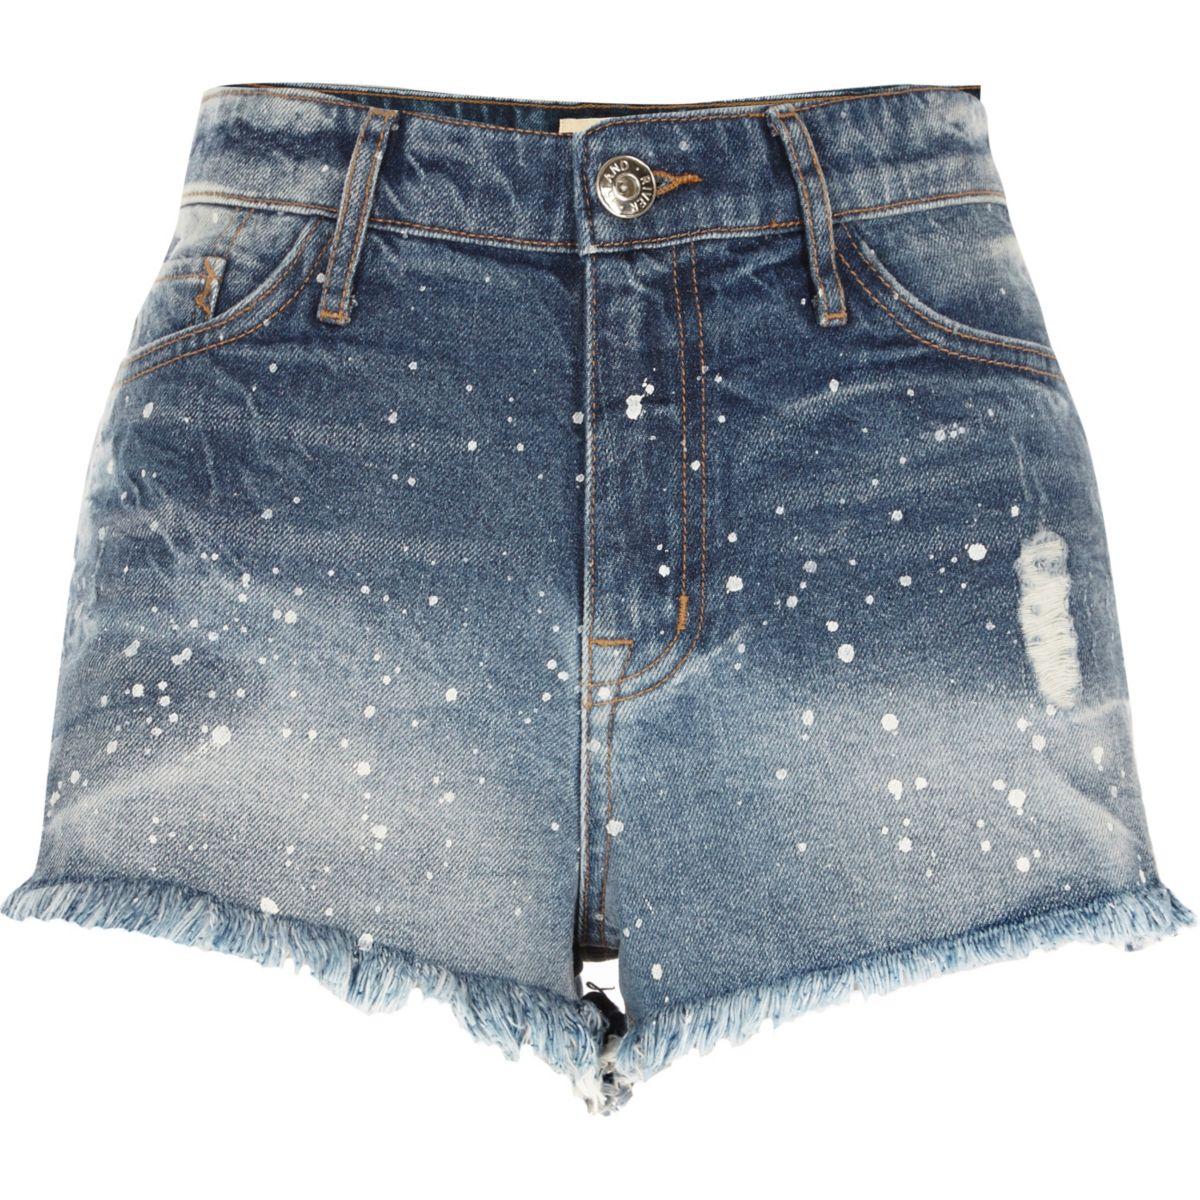 Jeans-Hotpants in Mittelblau mit Print